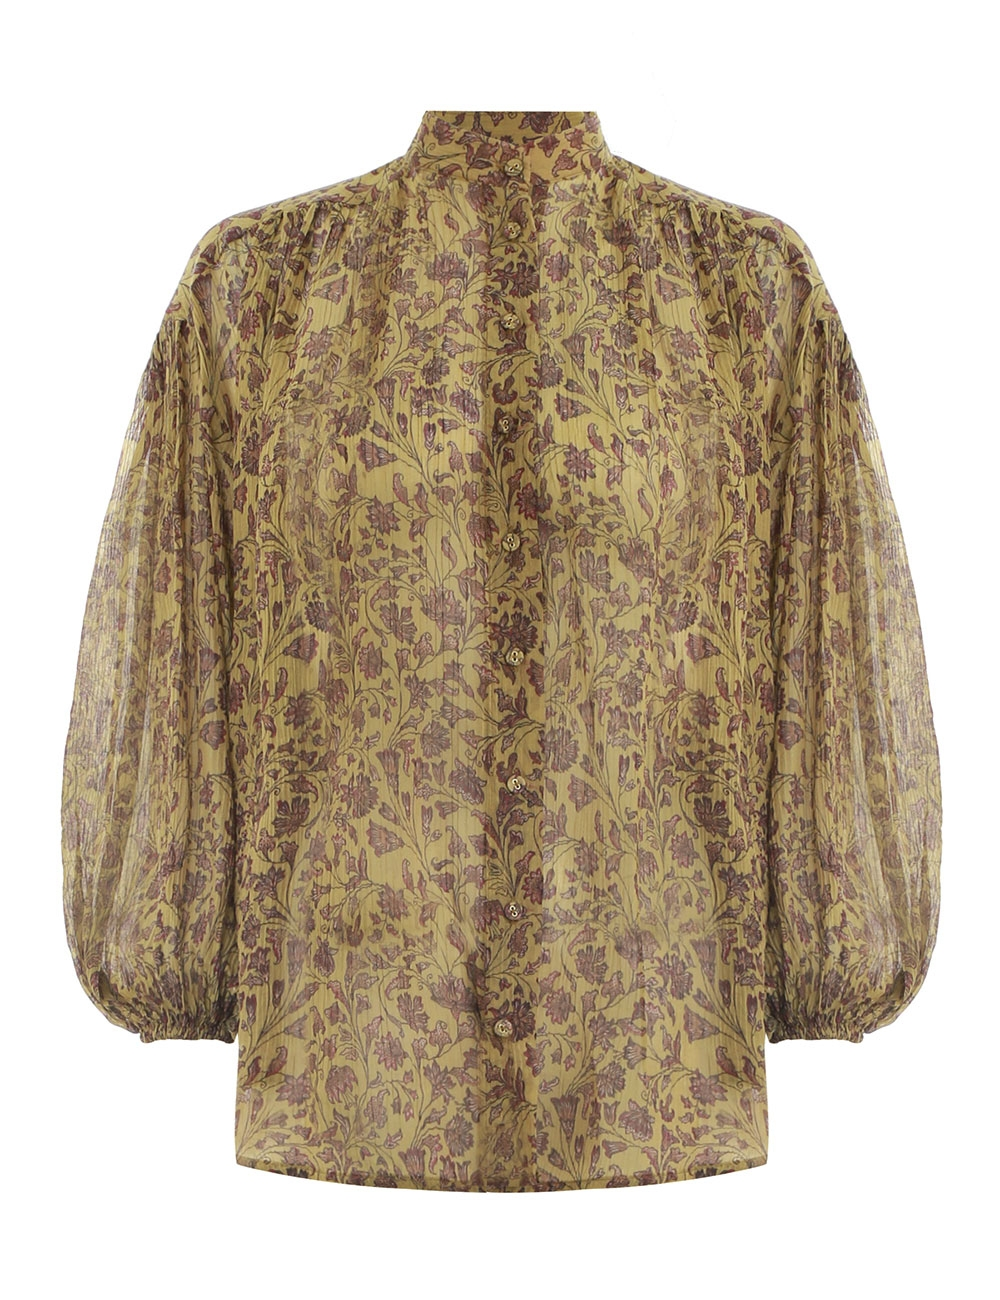 Juniper Crinkle Shirt